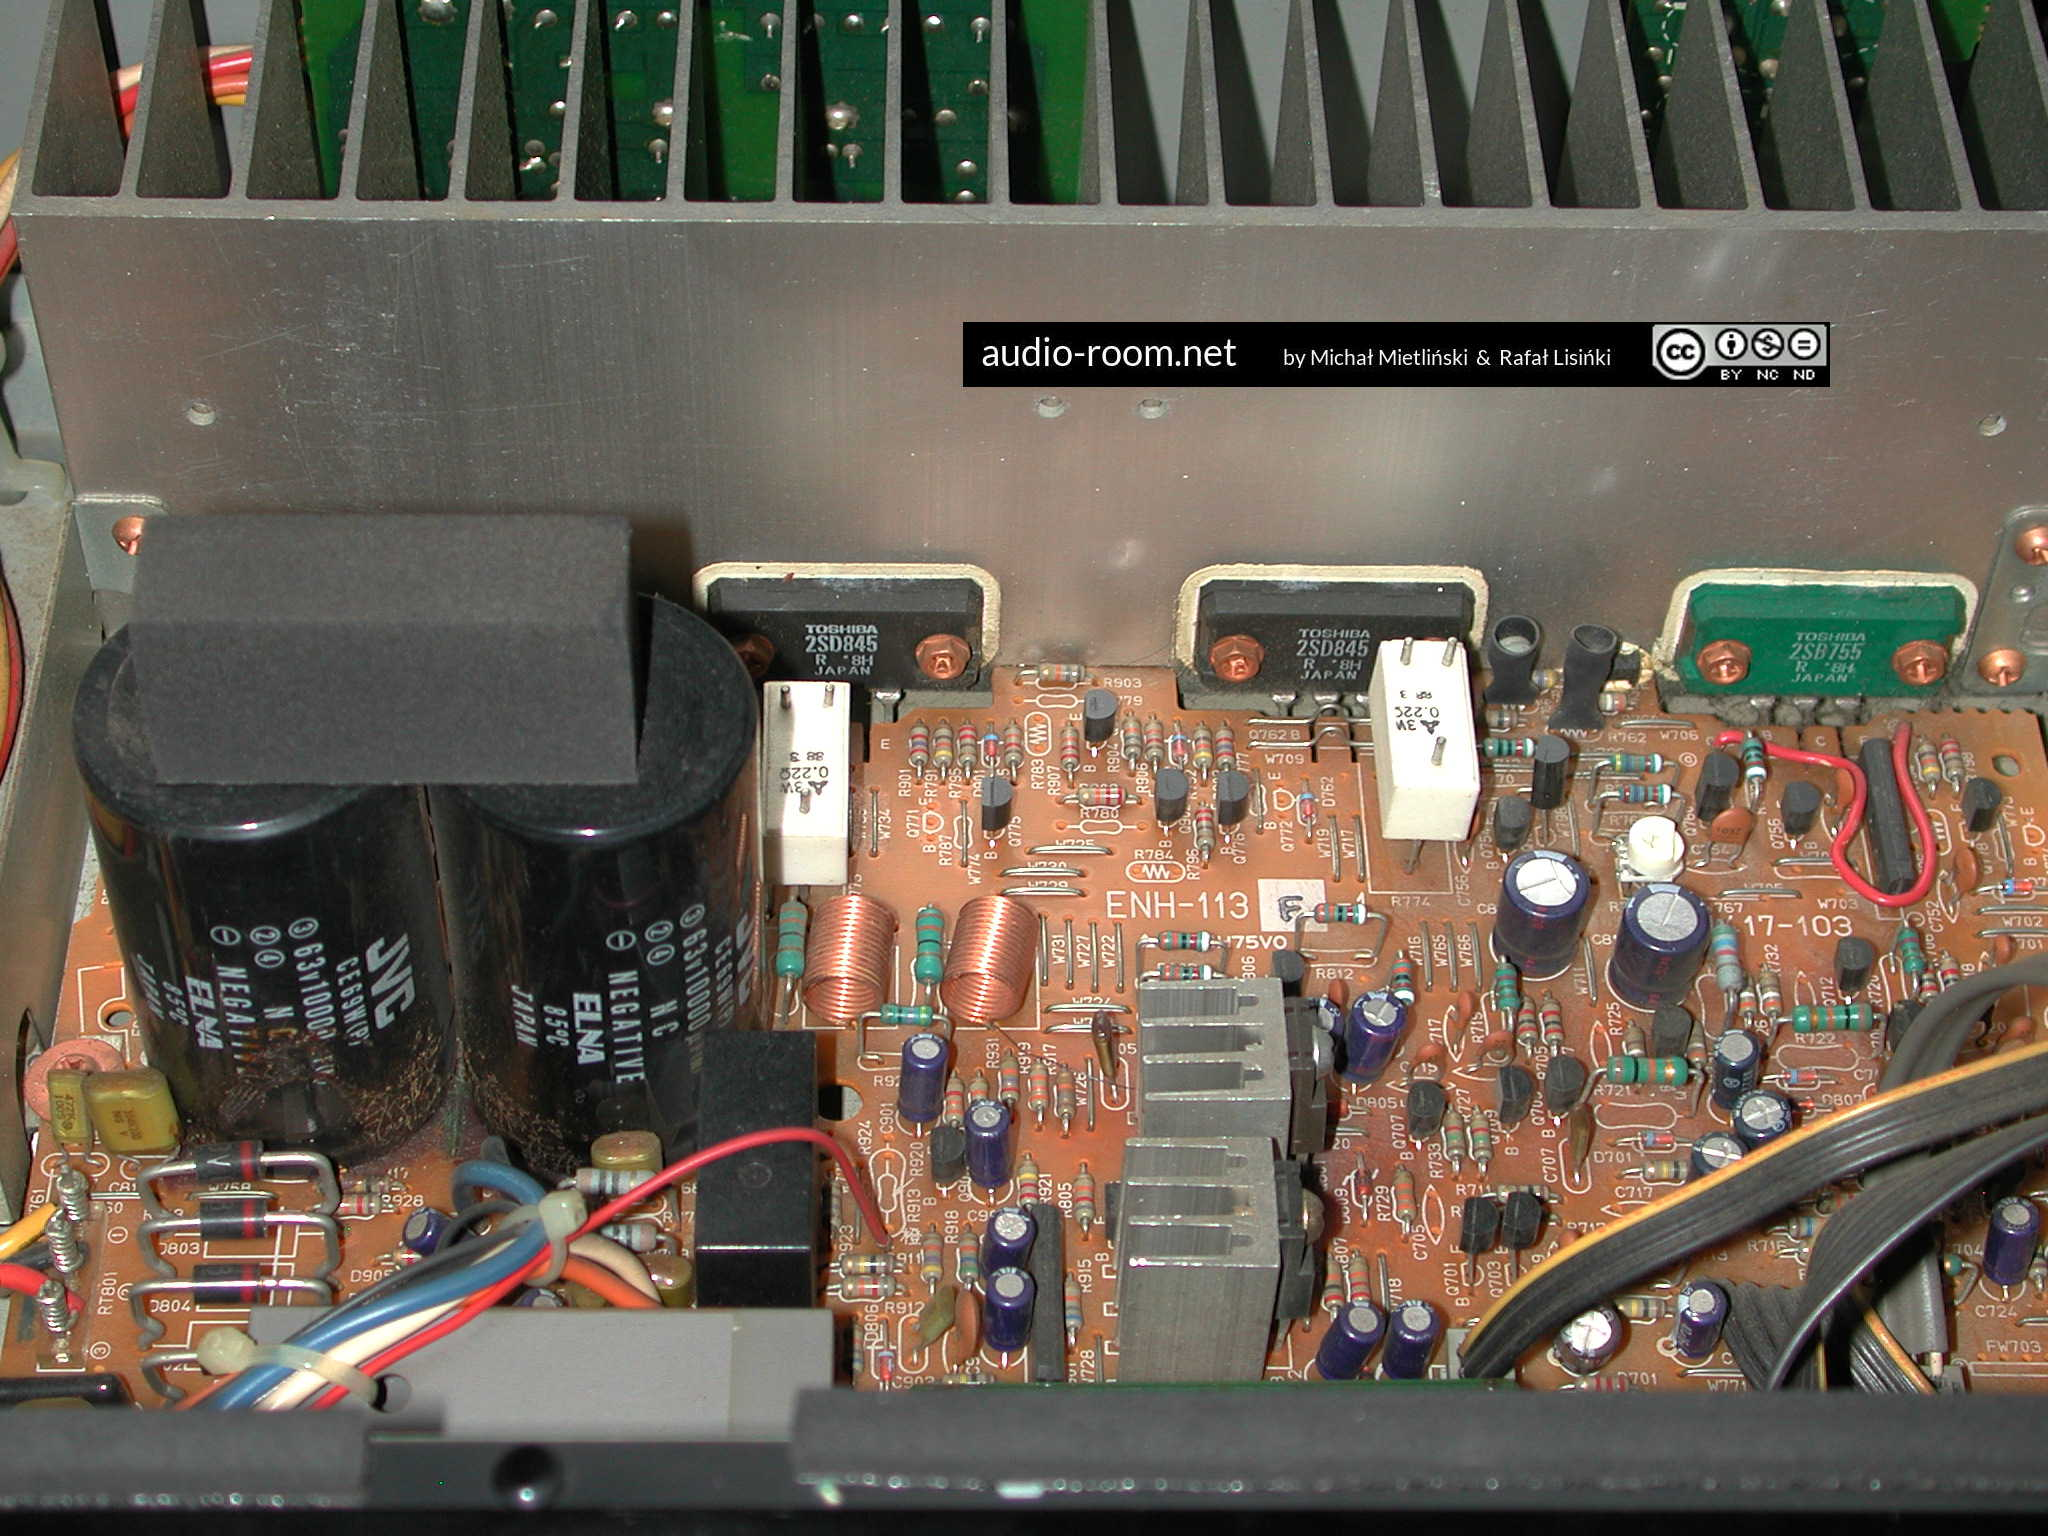 jvc-ax-444-dscn9576